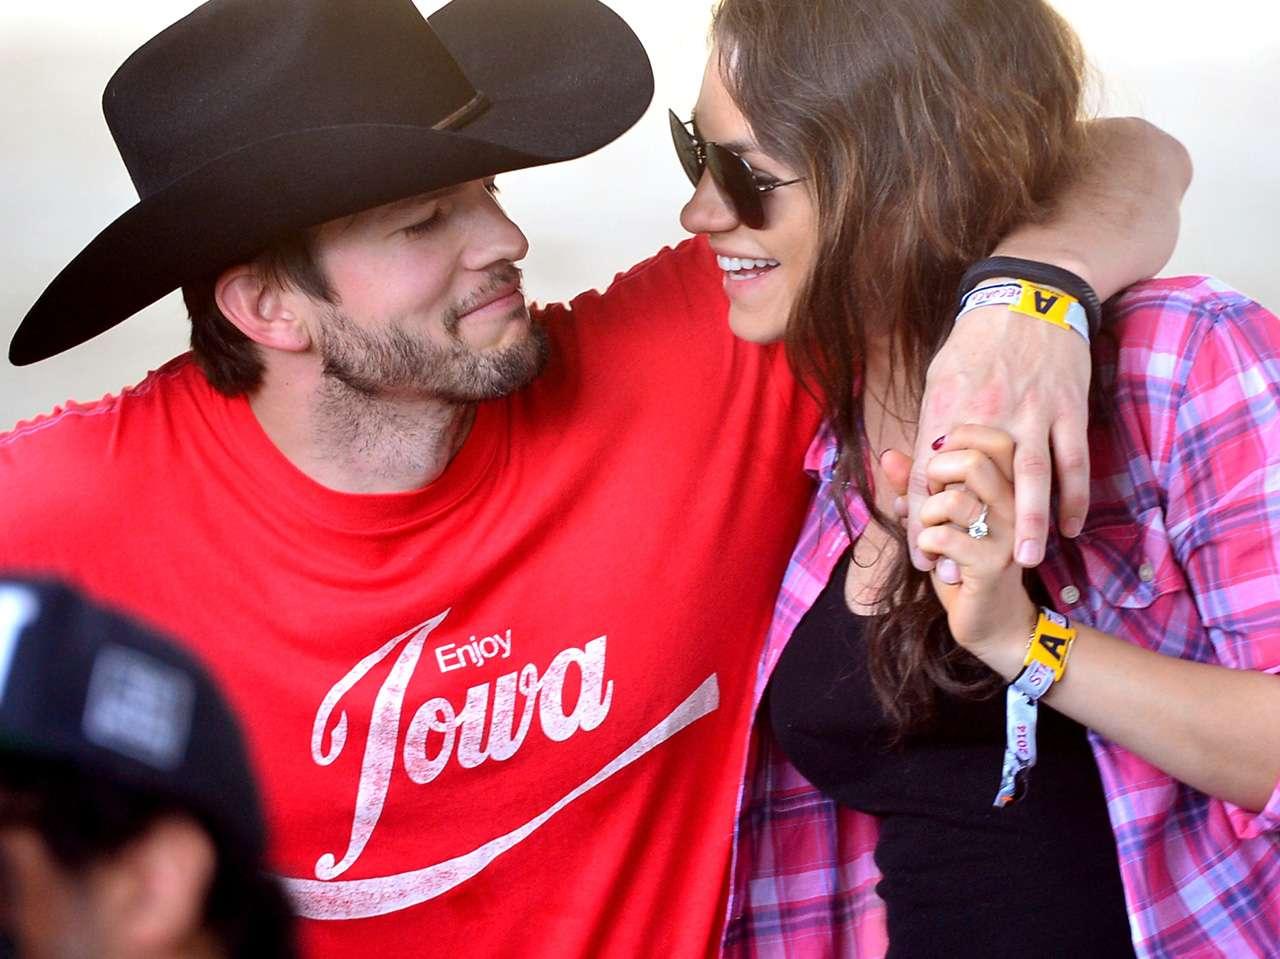 Ashton Kutcher y Mila Kunis se convirtieron en papás por primera vez Foto: Getty Images